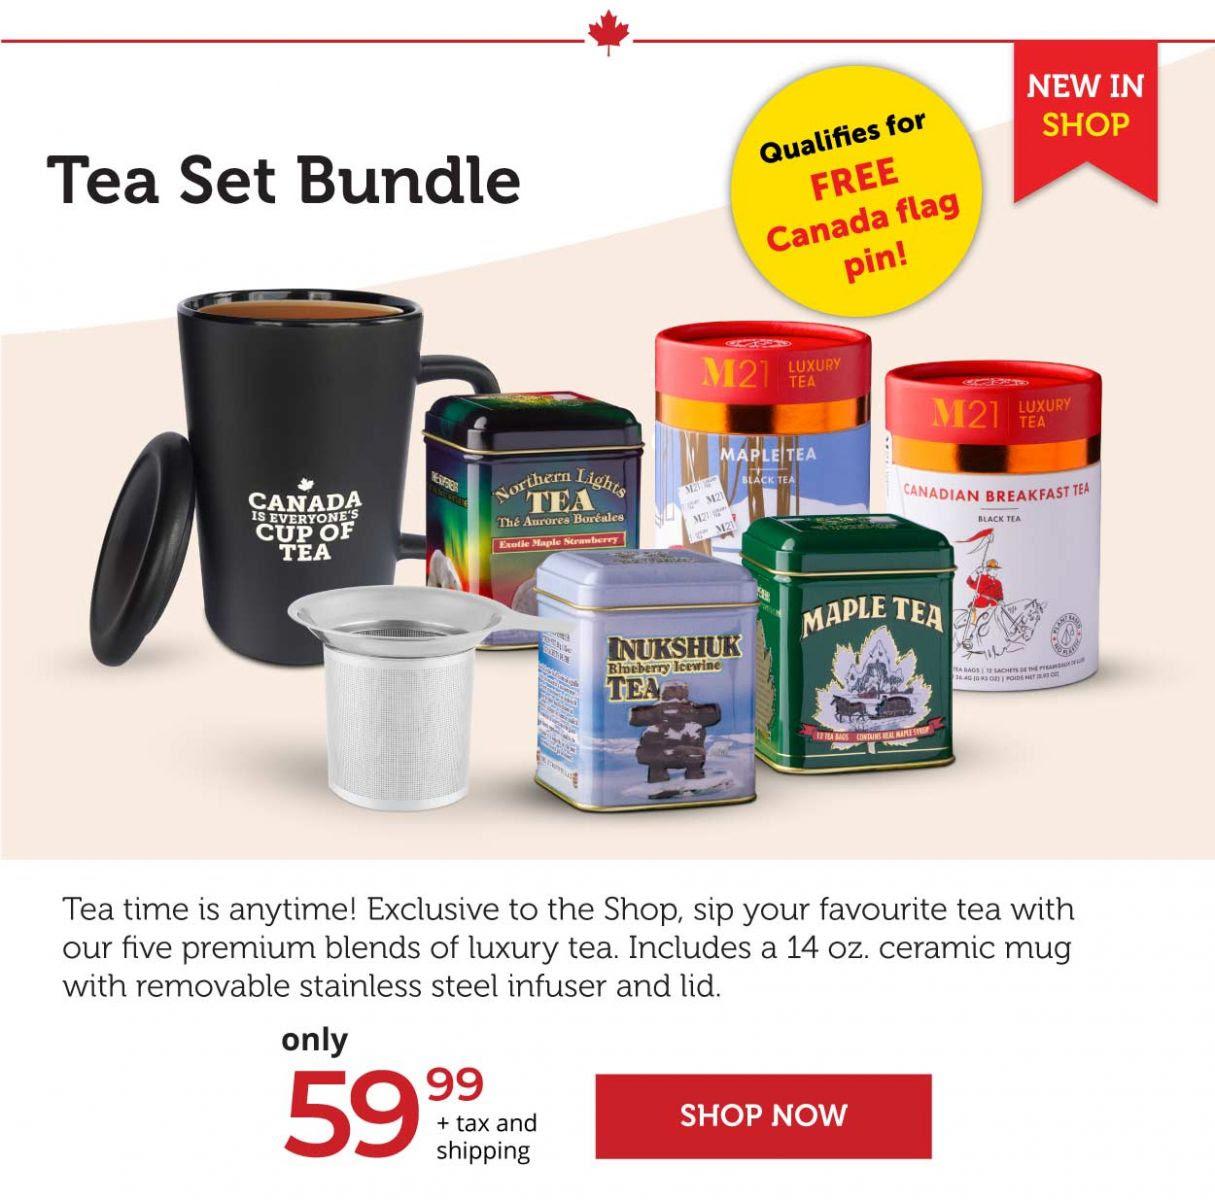 Celebrating Canada tea set bundle